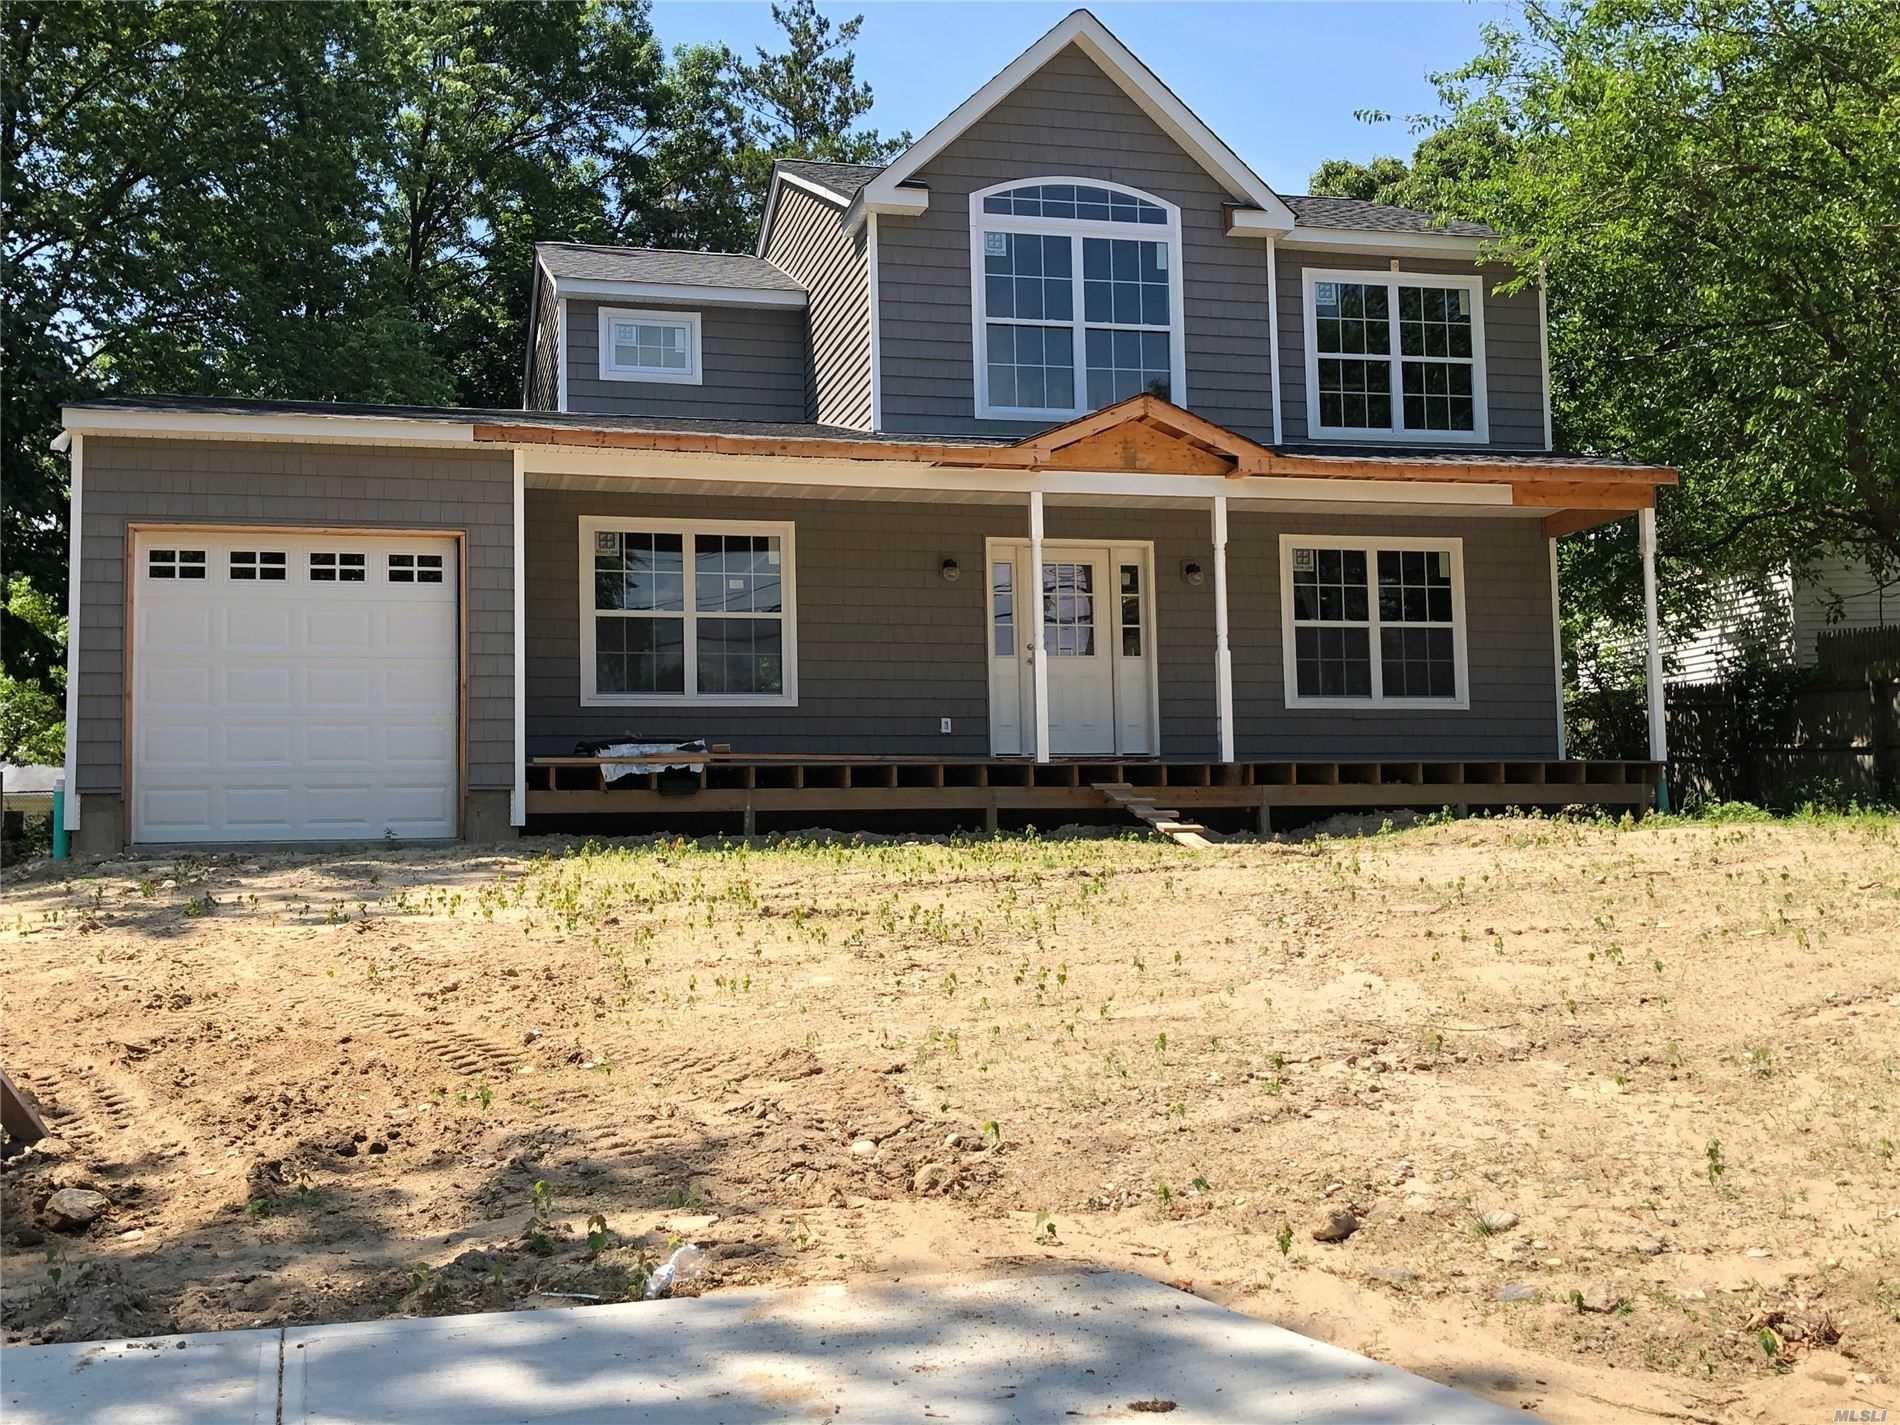 38 Crestwood Lane, Farmingville, NY 11738 - MLS#: 3148490